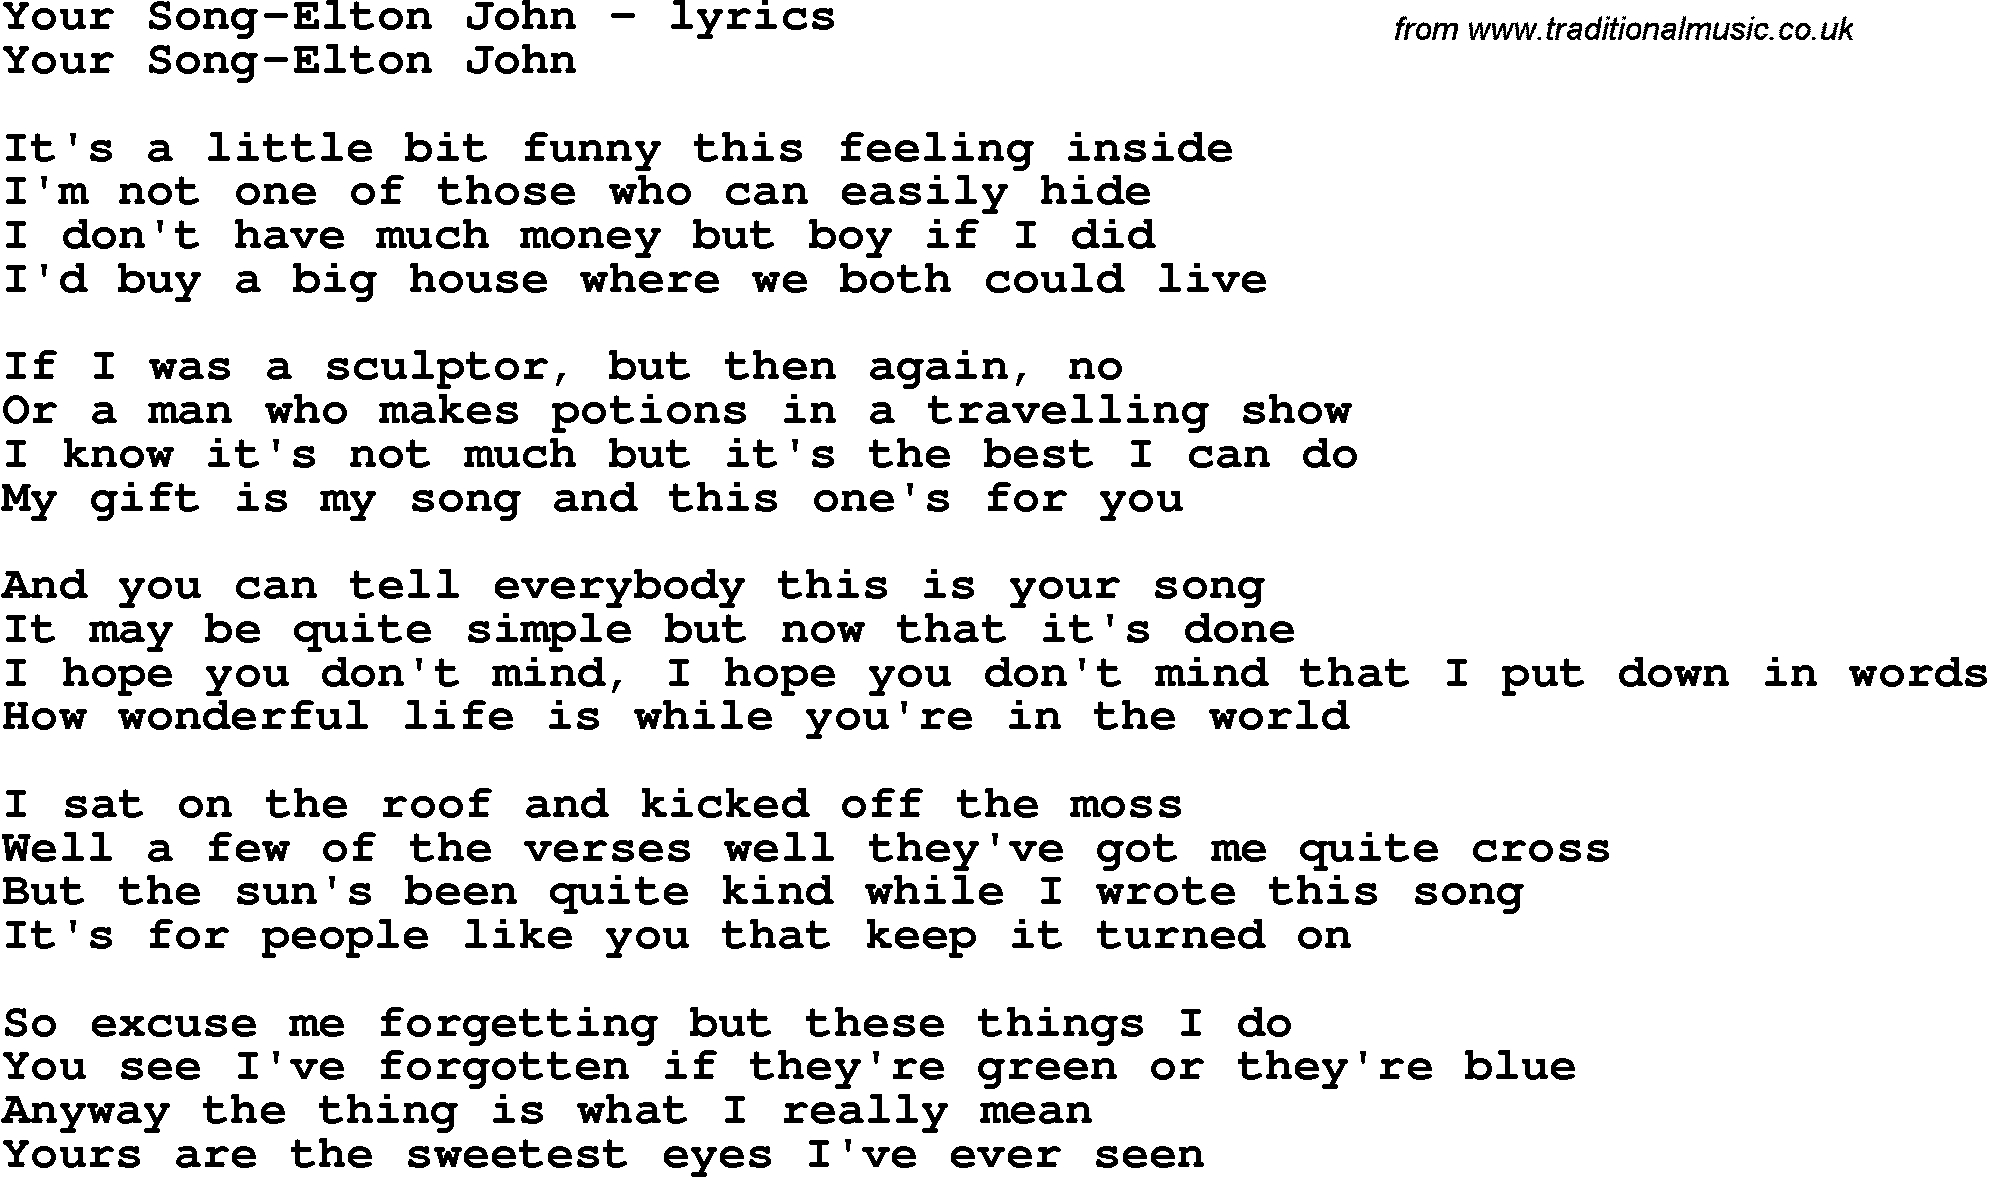 Love Song Lyrics For:your Song-Elton John - Free Printable Song Lyrics